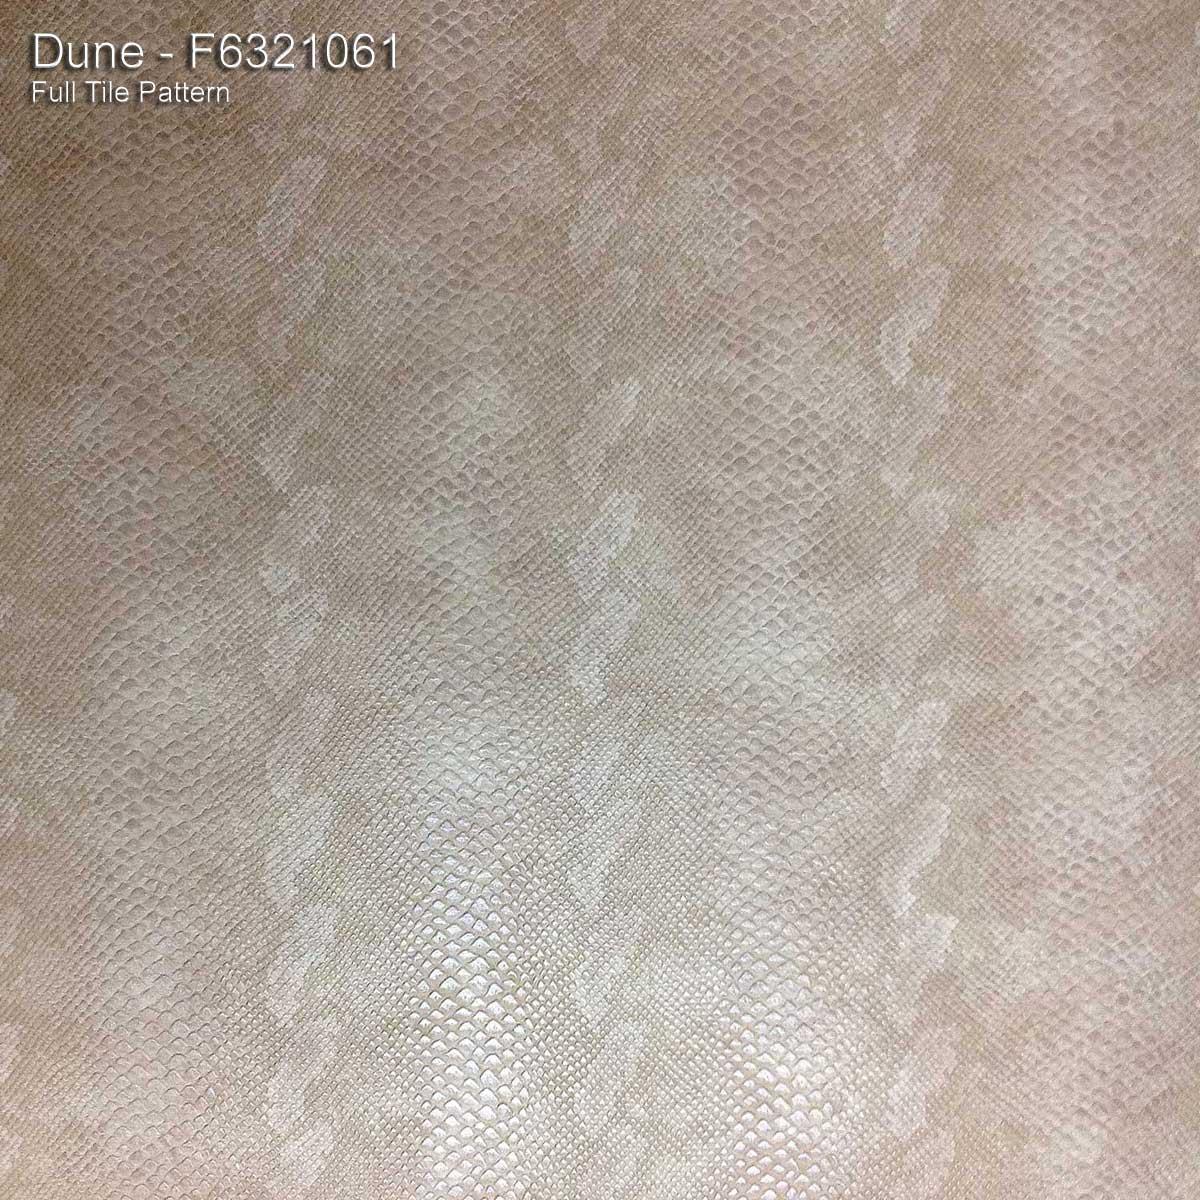 Balboa Snakeskin Tiles At Wishihadthat